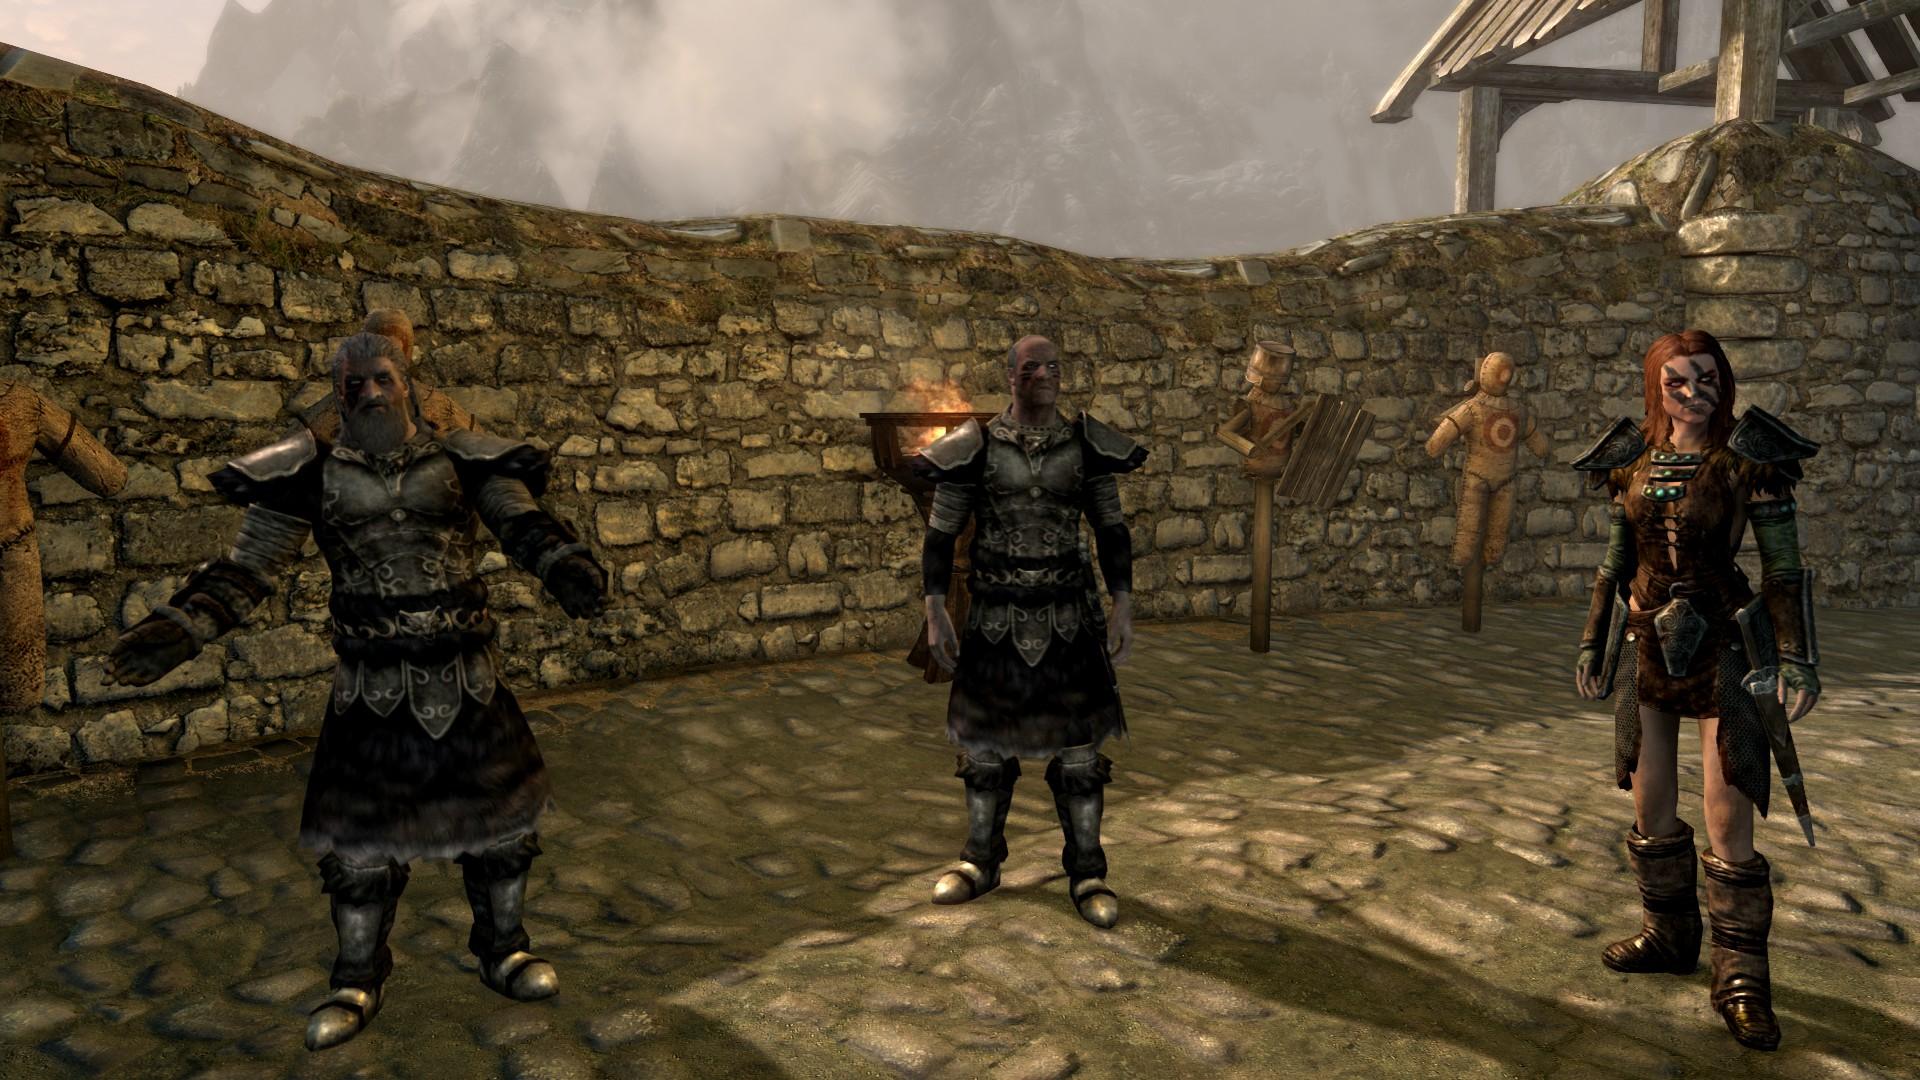 20180614222310_1.jpg - Elder Scrolls 5: Skyrim, the